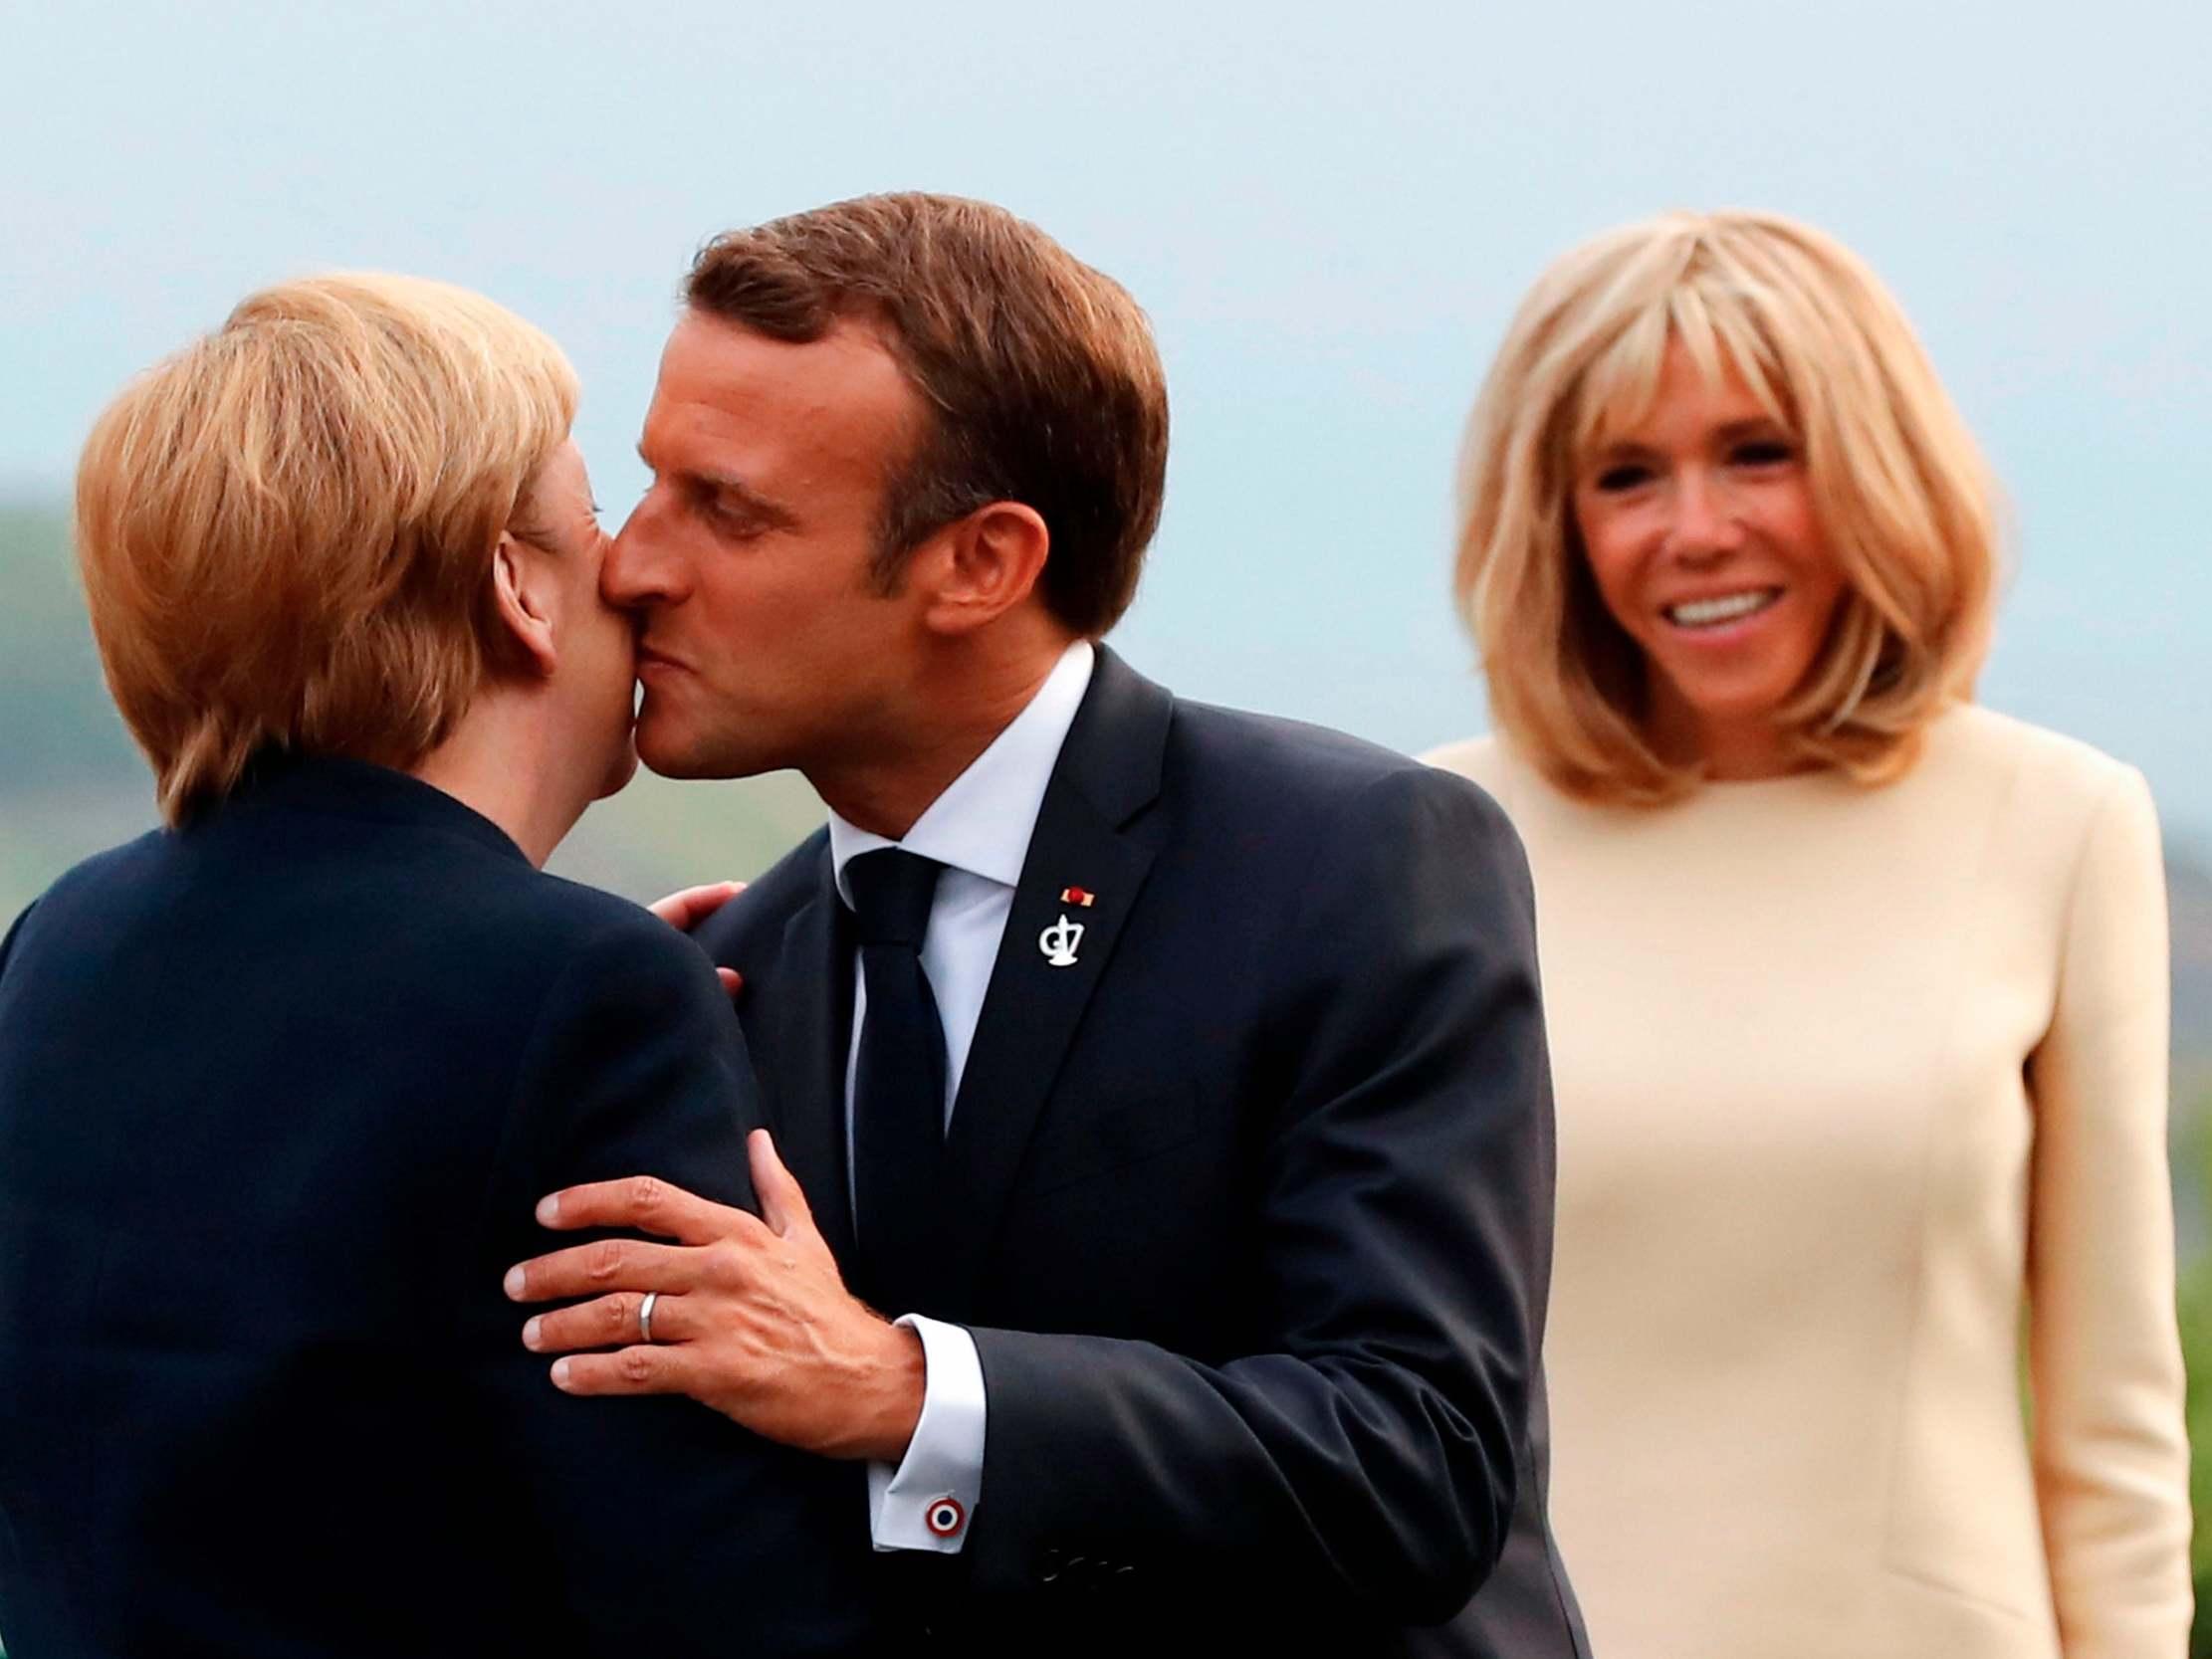 Macron furious after Jair Bolsonaro mocks his wife's looks